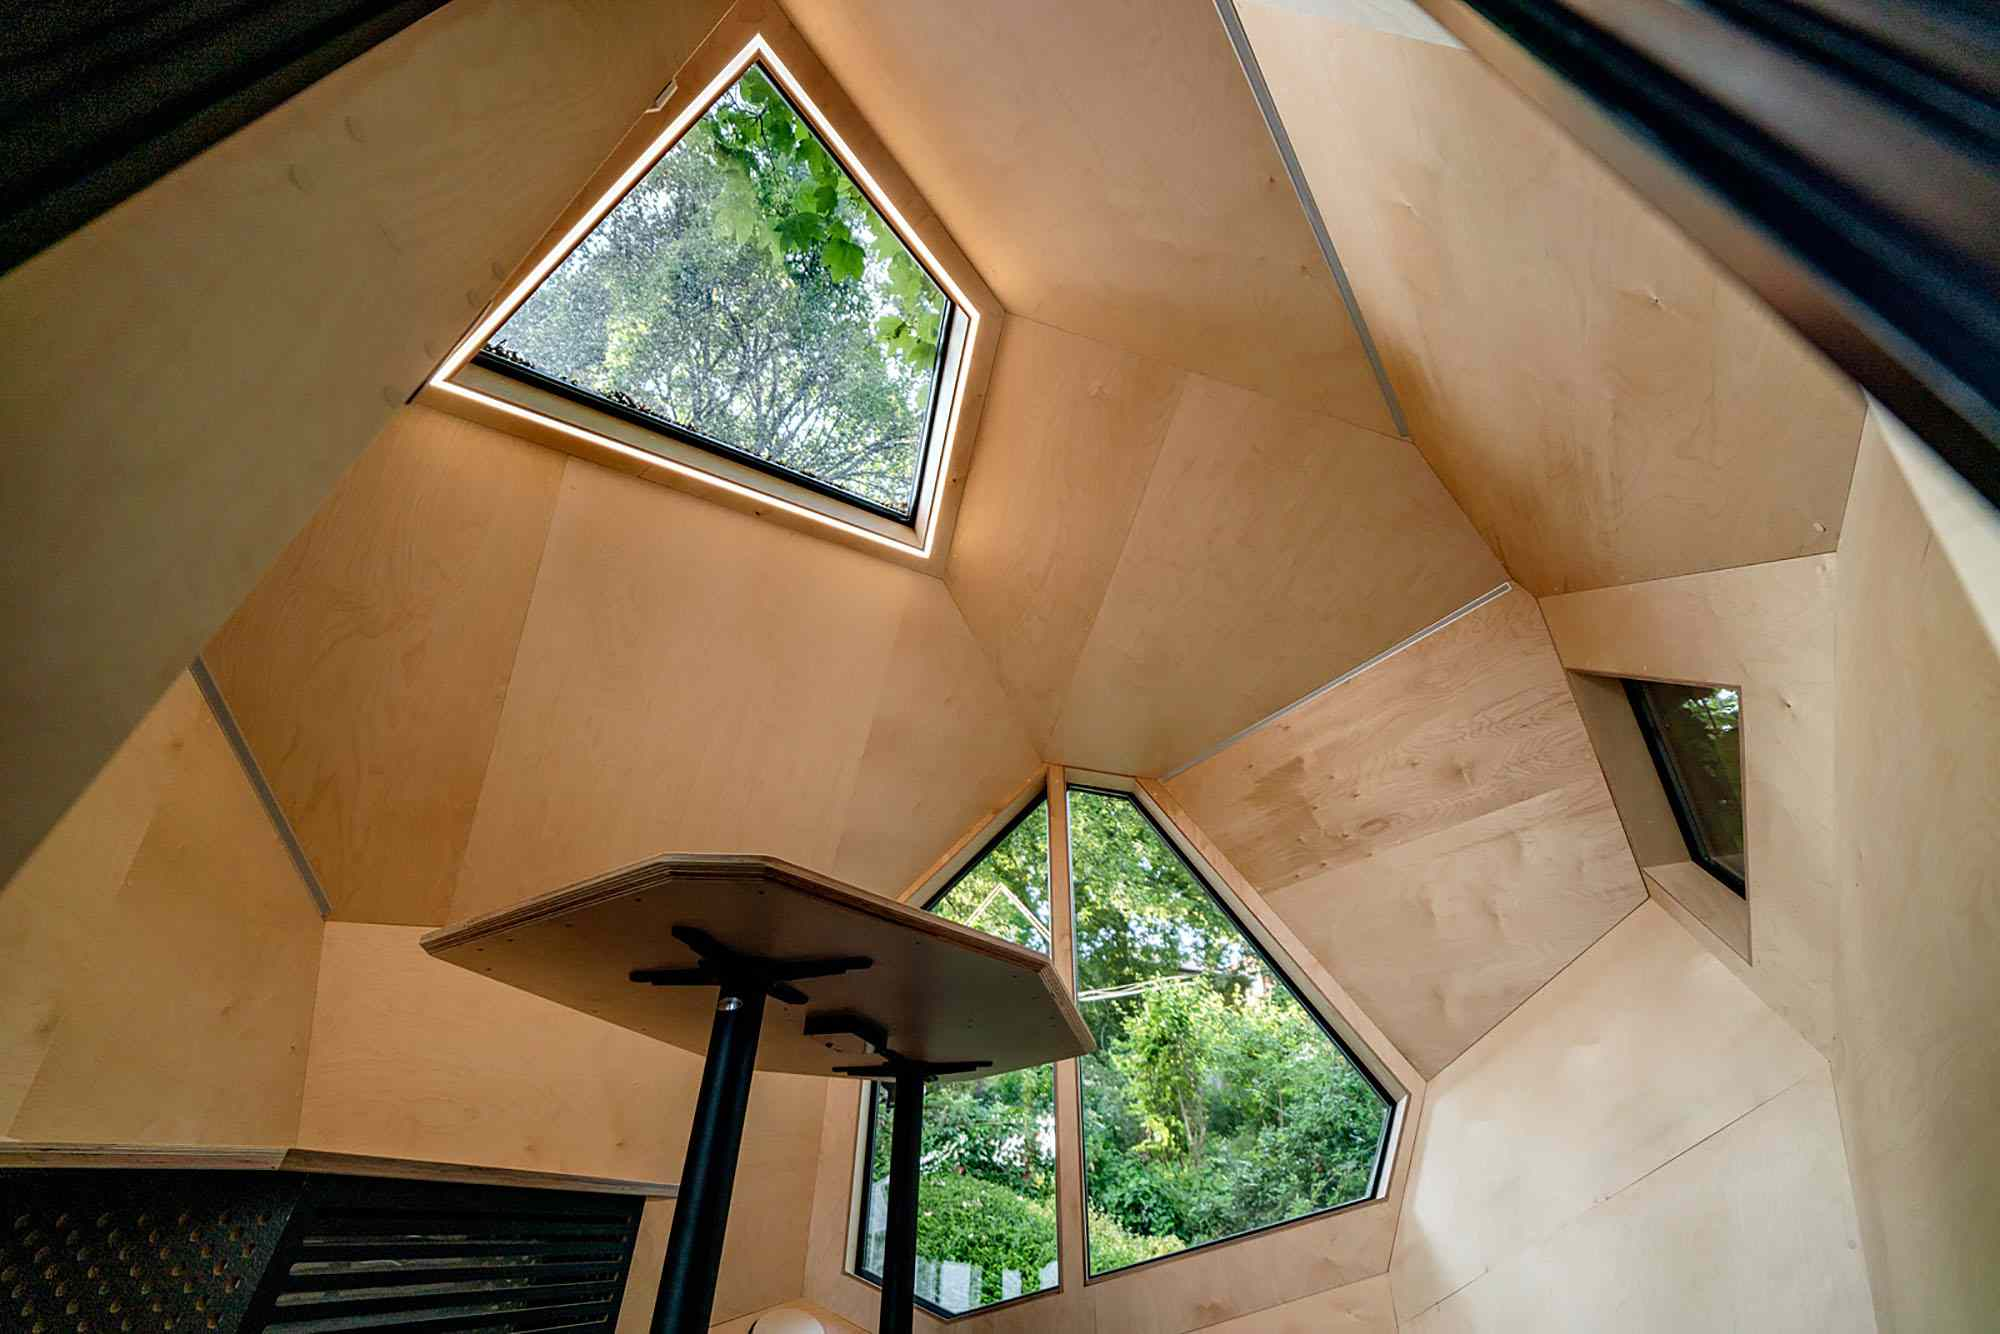 Workstation Cabin prefab home office module by Hello Wood windows